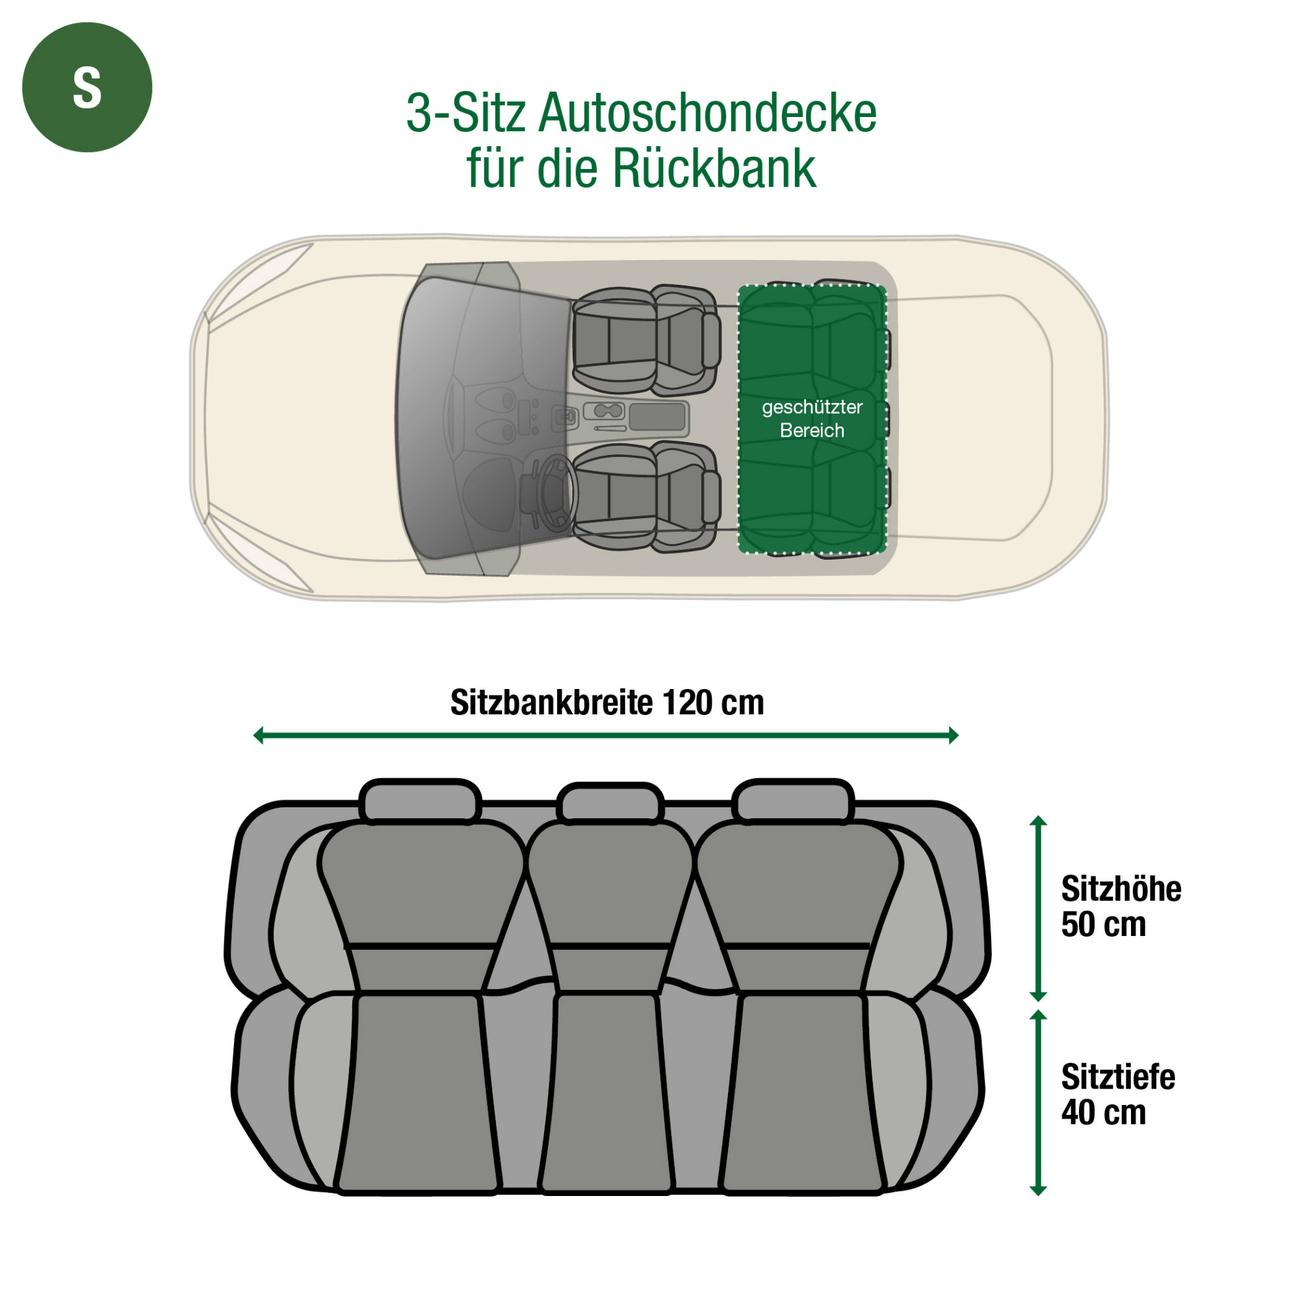 Doctor Bark Autodecke 3-Sitz Rücksitz, Bild 21